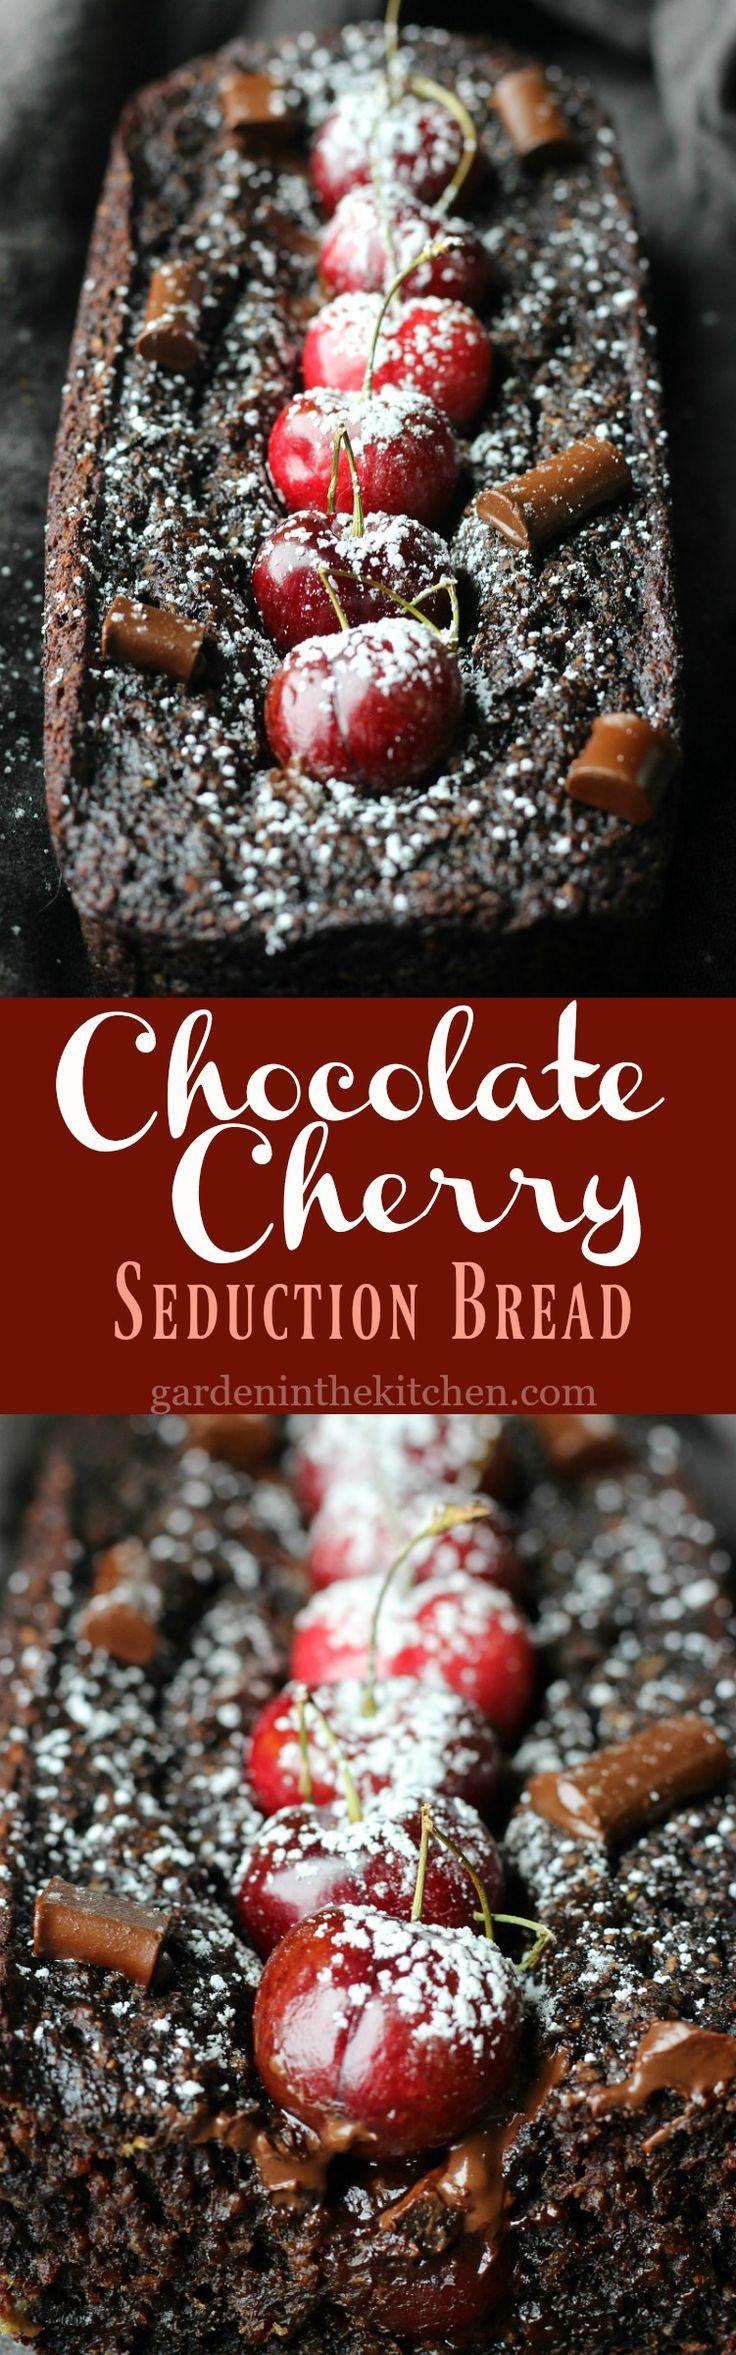 Chocolate Cherry Seduction Bread